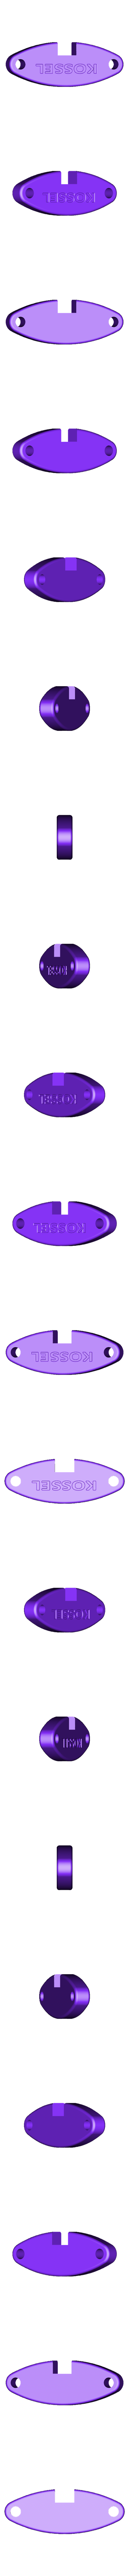 Top_only2.STL Download free STL file Kossel Mini spool holder, adjustable width • 3D print model, Matteeee